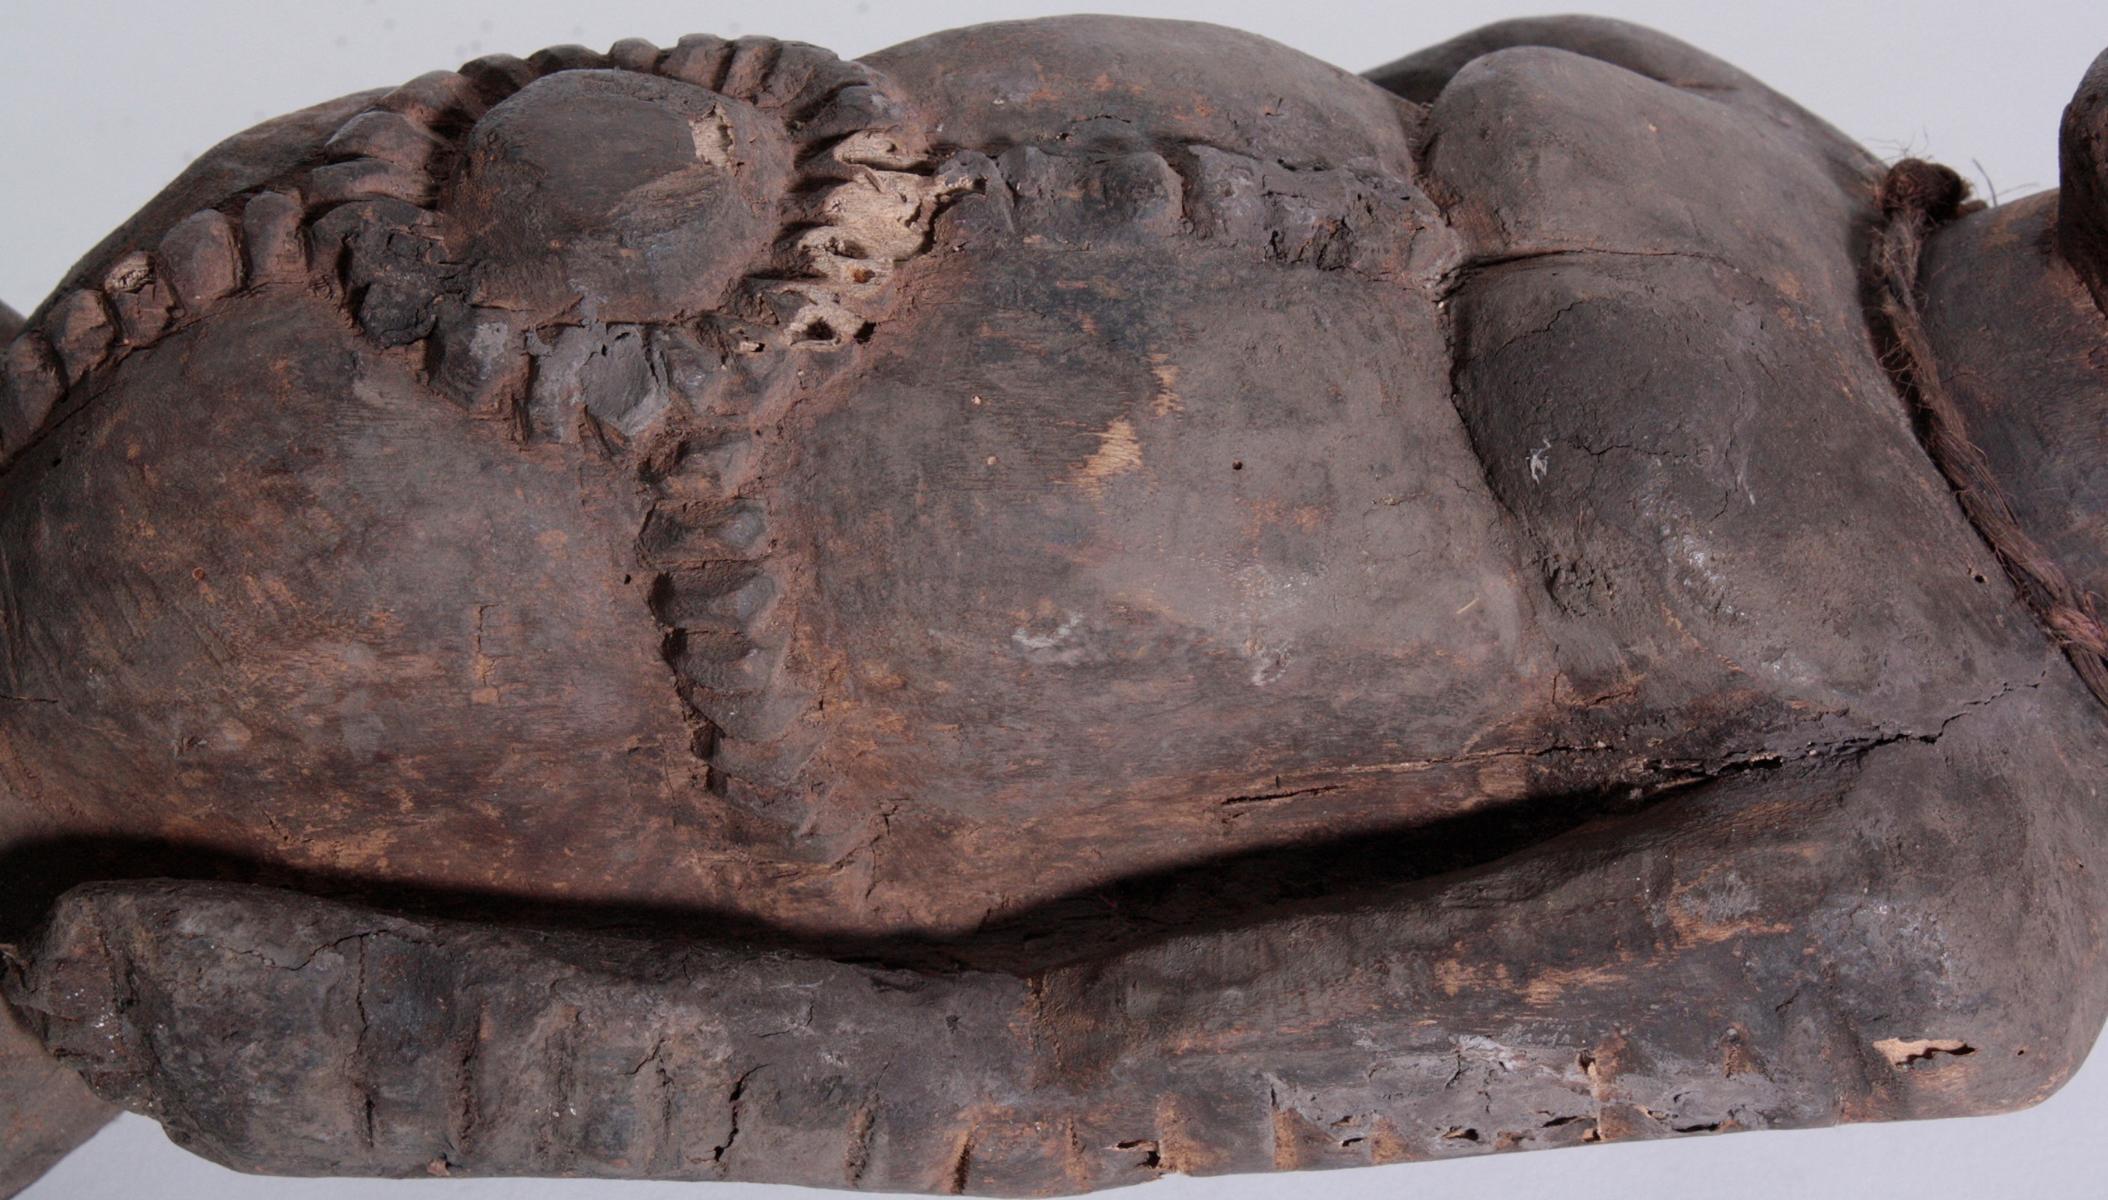 Ältere Ahnen-Figur, Tabwa, D. R. Kongo-8